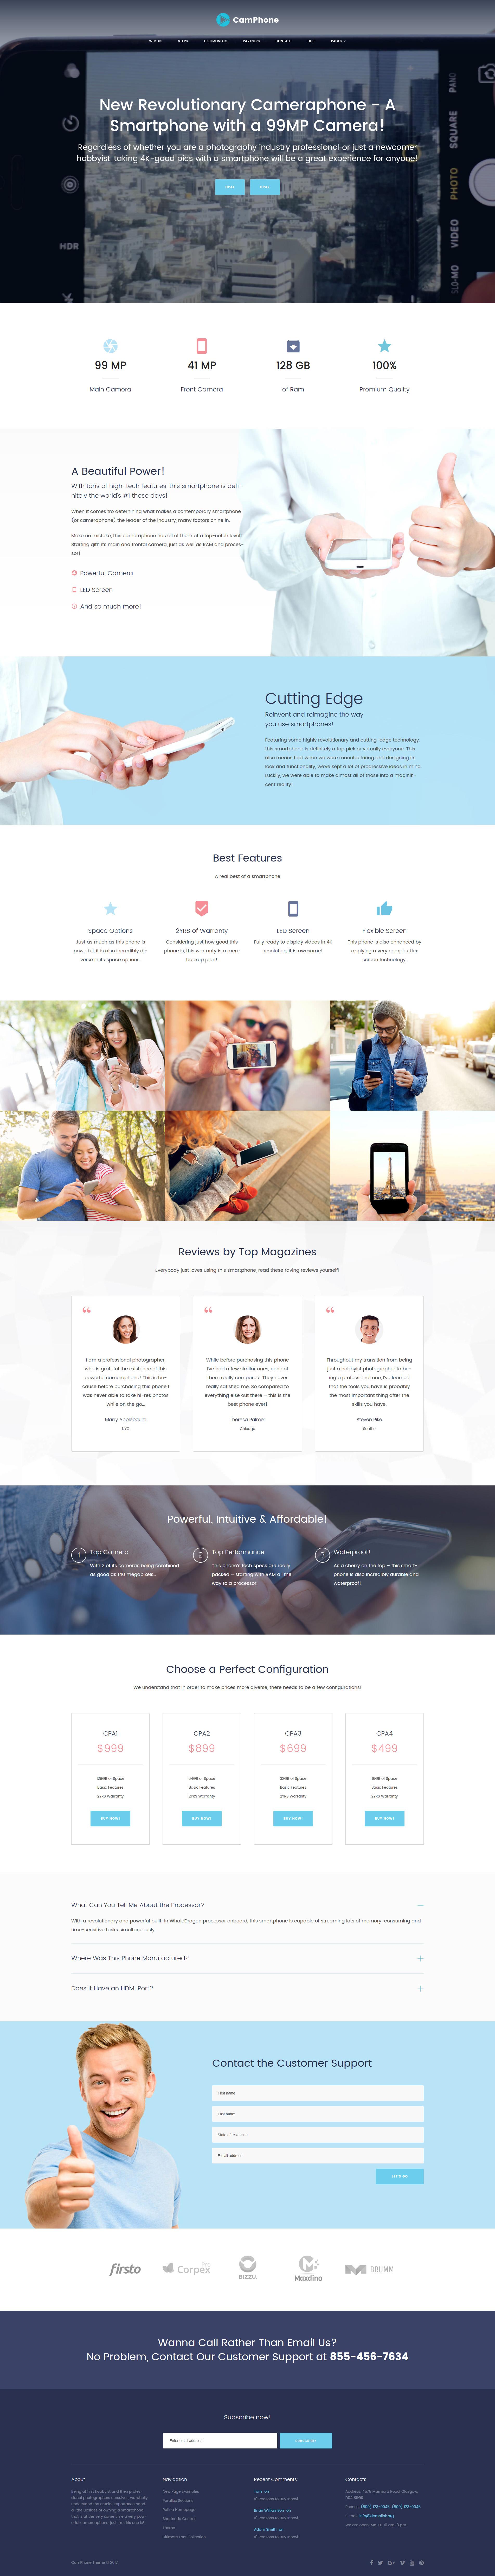 """CamPhone - Page d'Accueil Adaptative Smartphone"" thème WordPress adaptatif #63380"